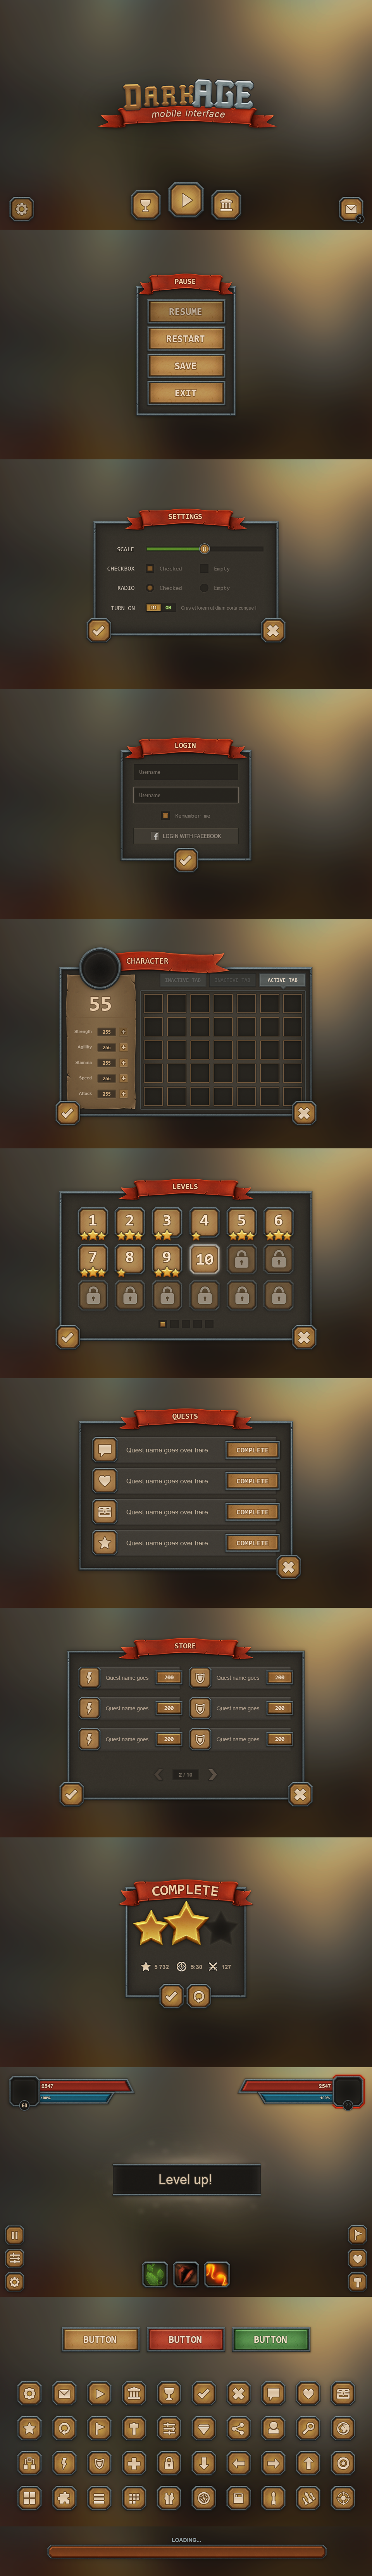 DarkAge Mobile UI by Evil-S